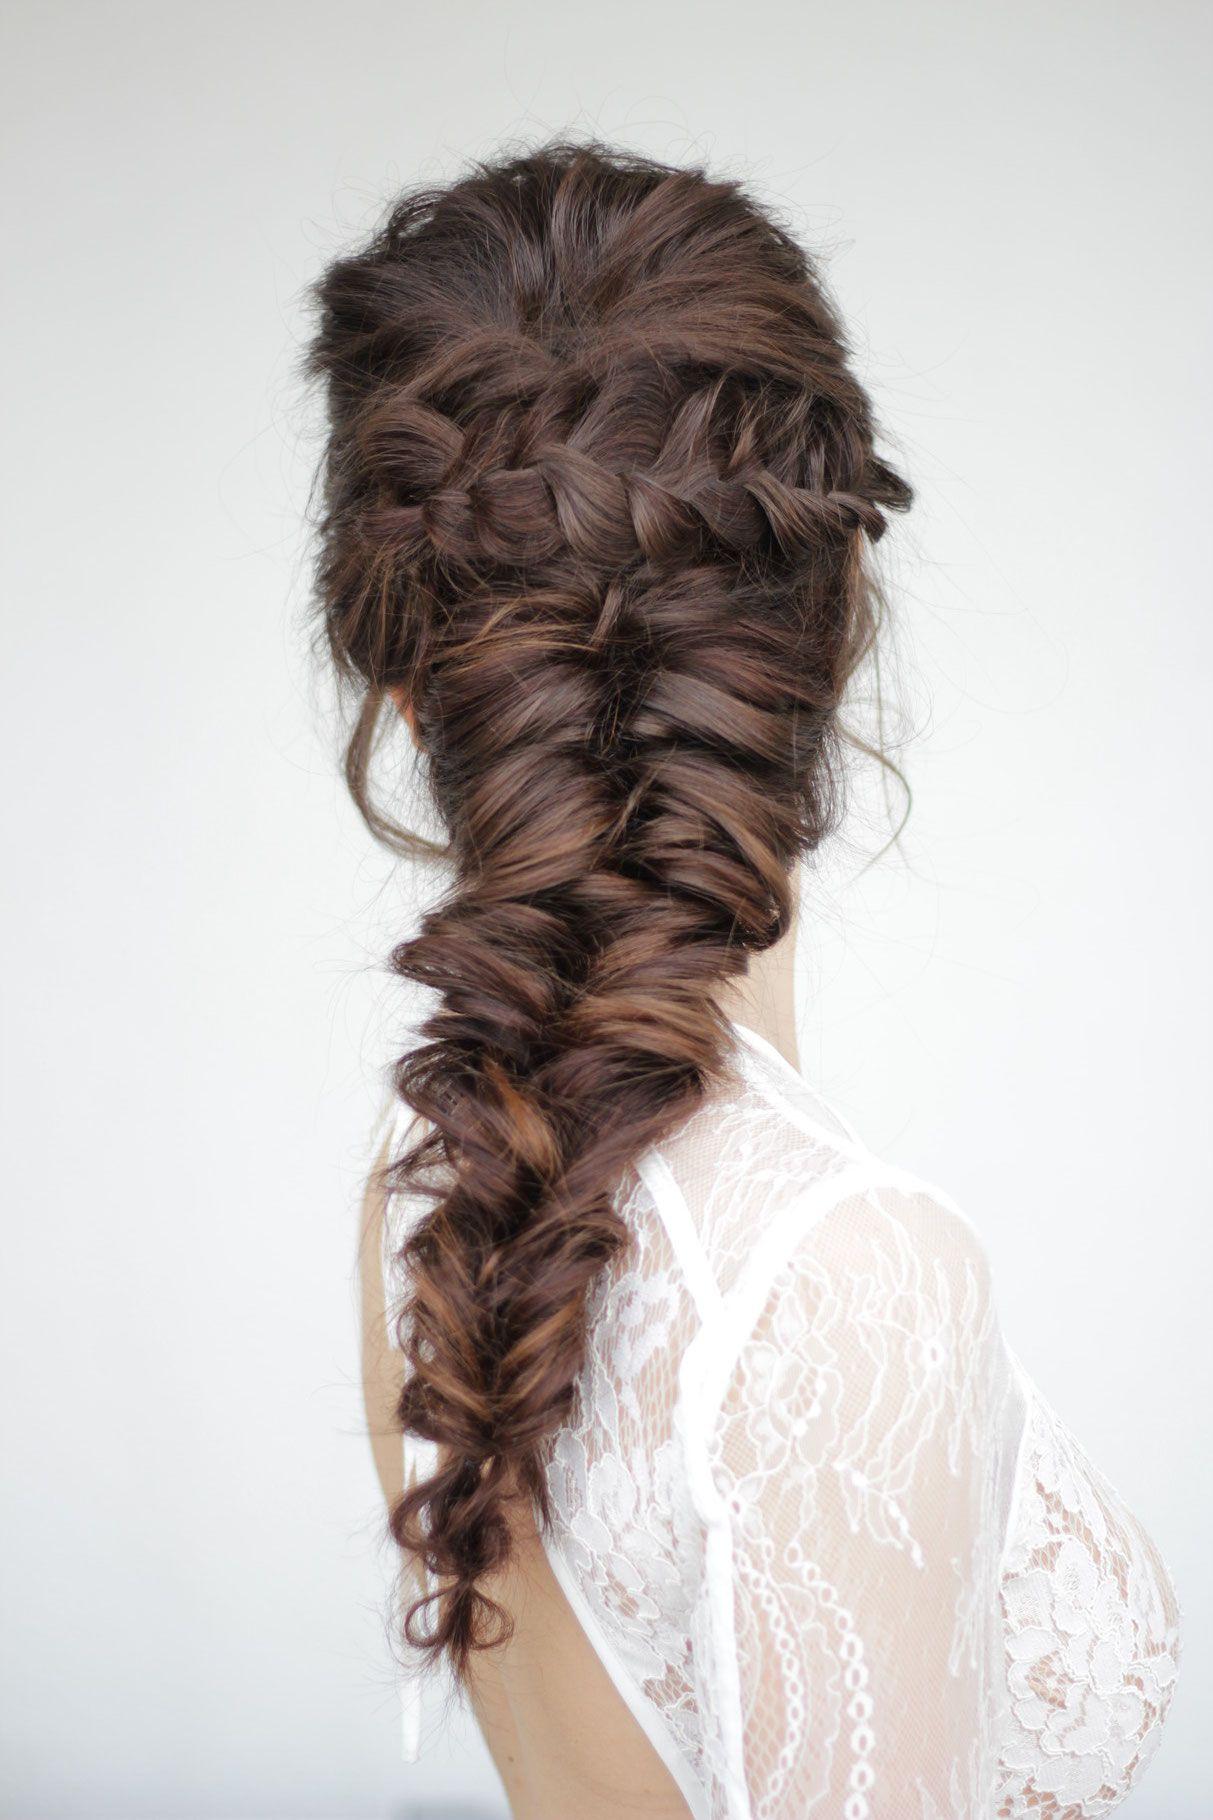 Mermaid Braid Cowgirl Bohemian Boho Hairstyle CowgirlHairstyle